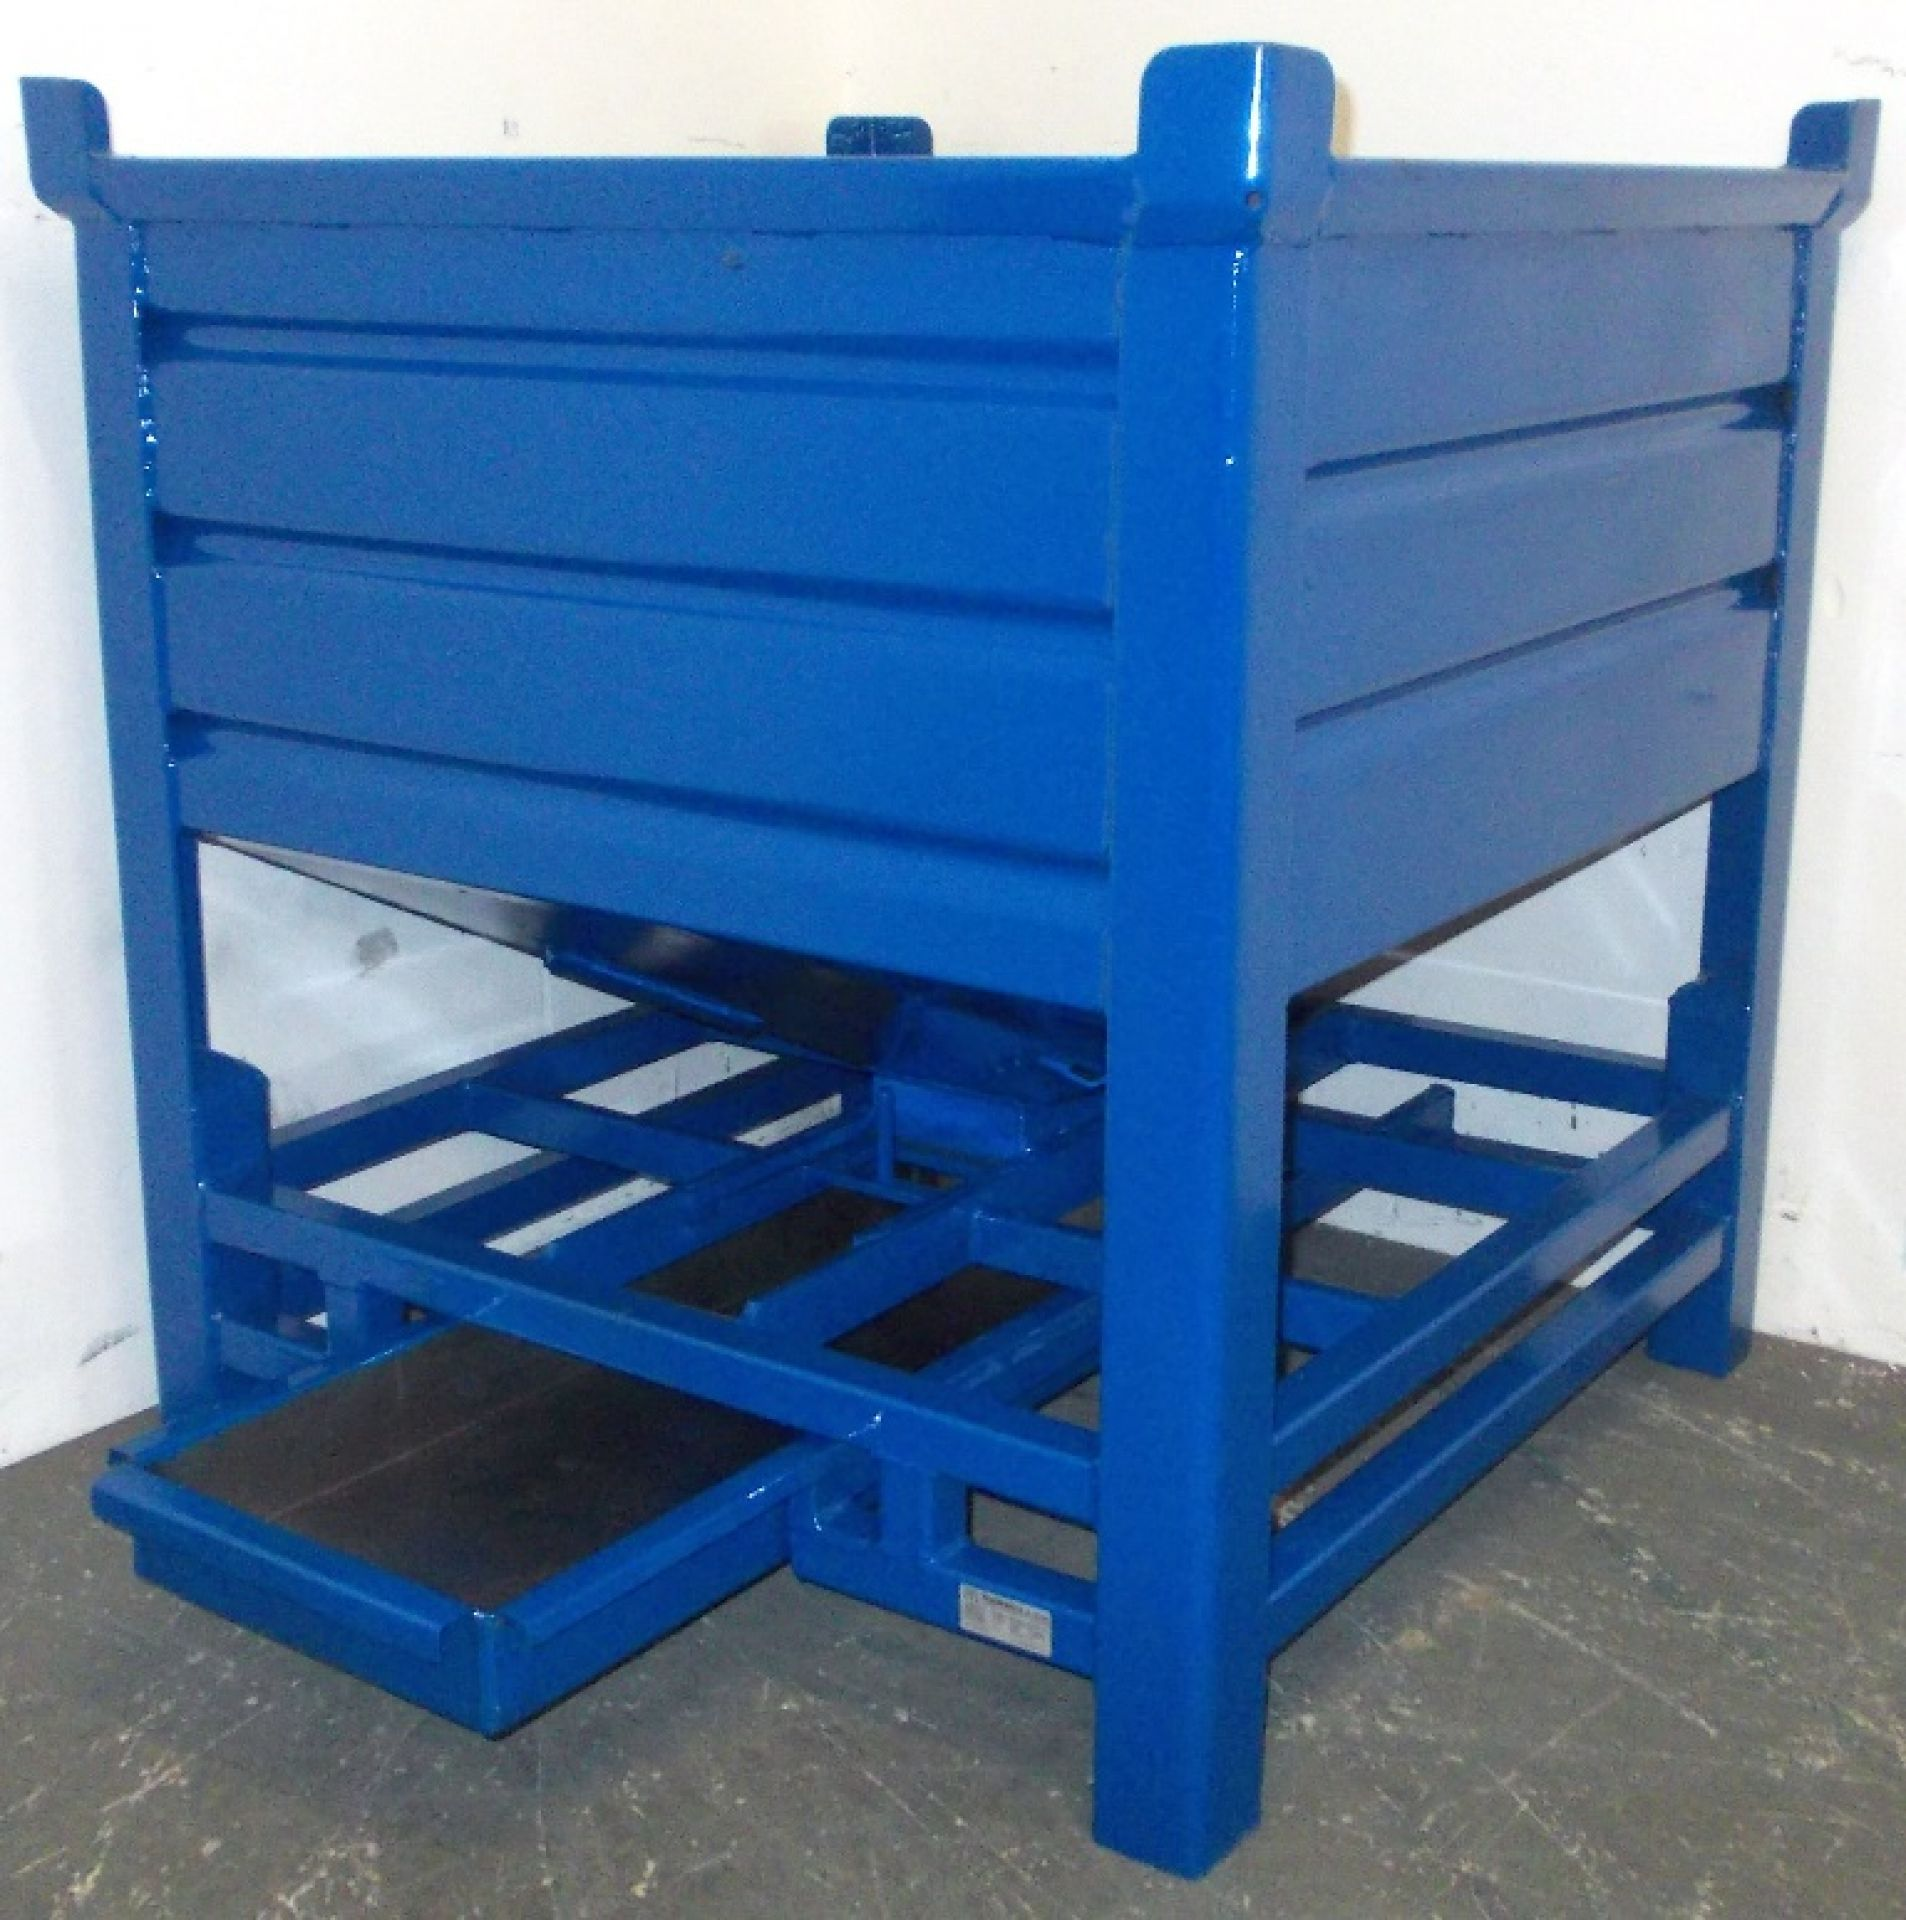 Silobehälter mit Ölwanne blau lackiert